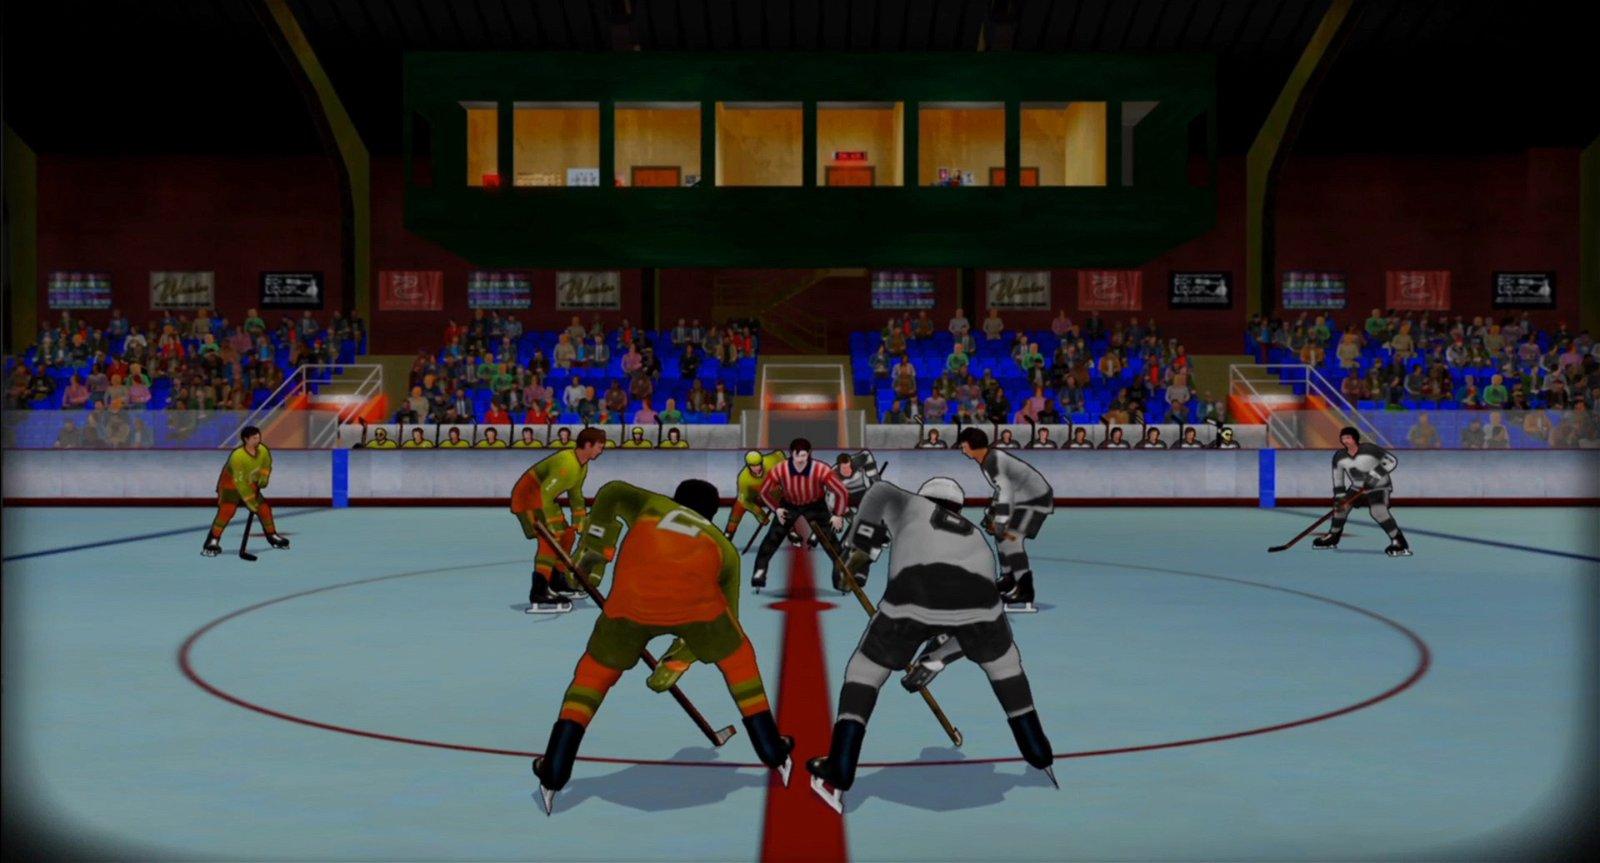 Old Time Hockey Review - Hitz Meets Slapshot 1